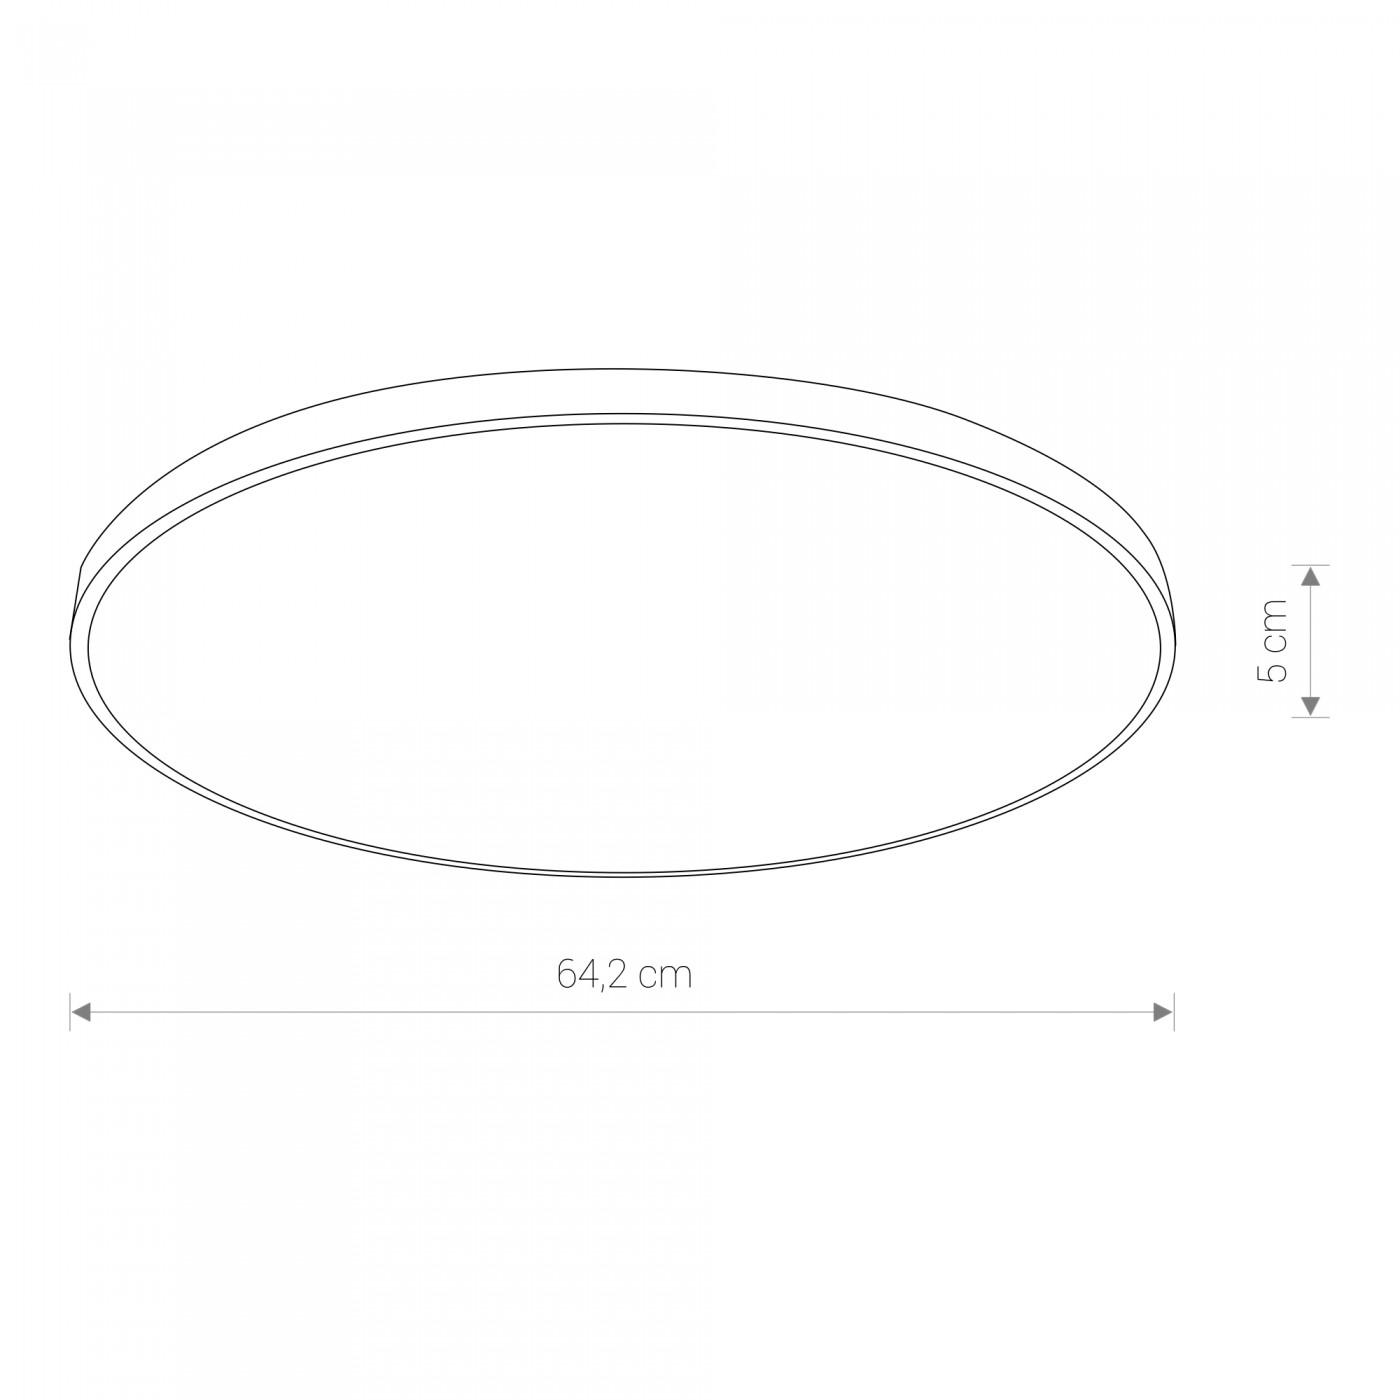 Nowodvorski TL-8210 Agnes Round LED víz-védett mennyezeti lámpa